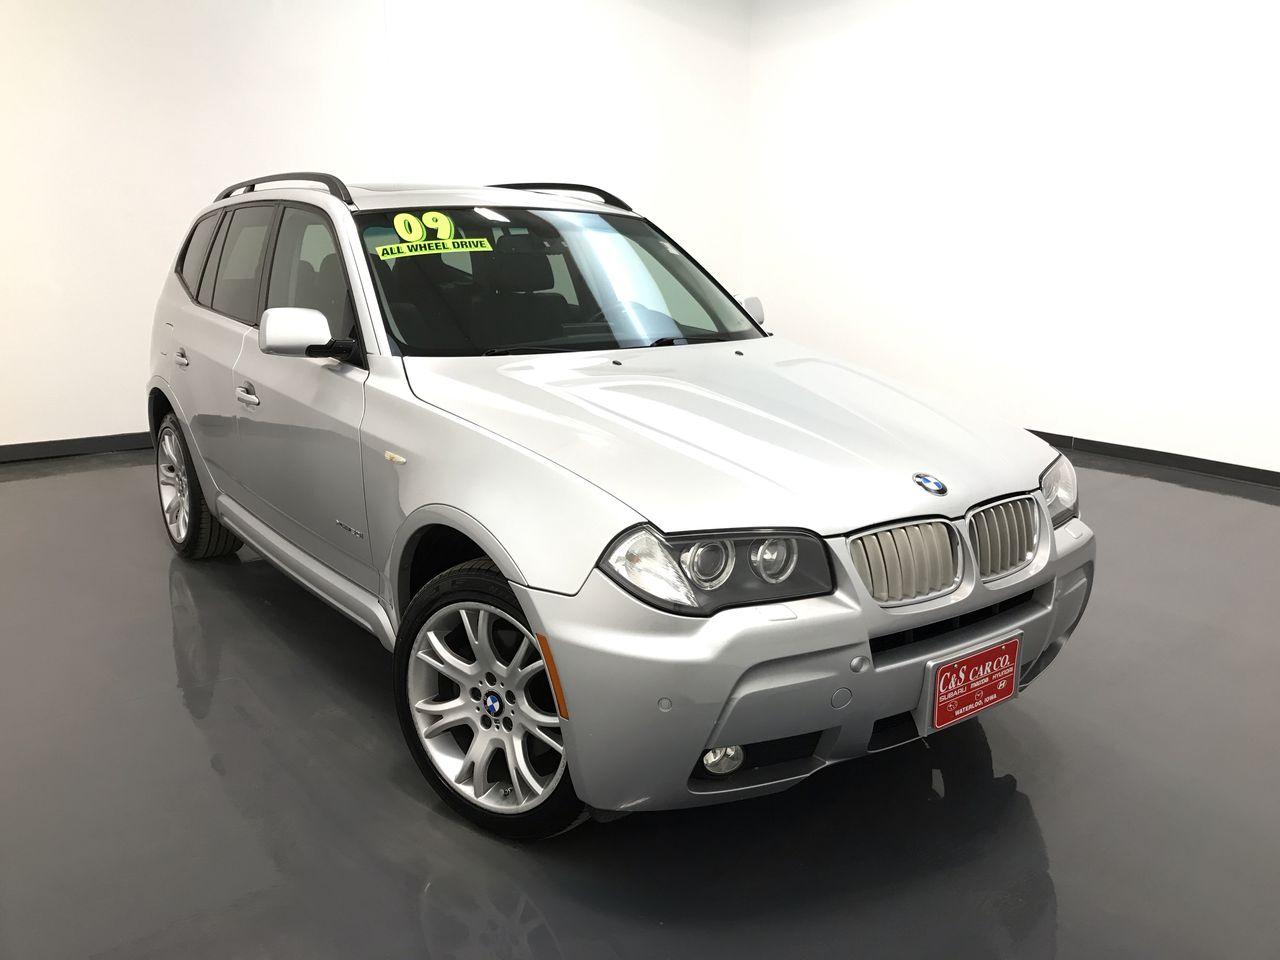 2009 BMW X3 XDrive  3.0i  - SB8241B  - C & S Car Company